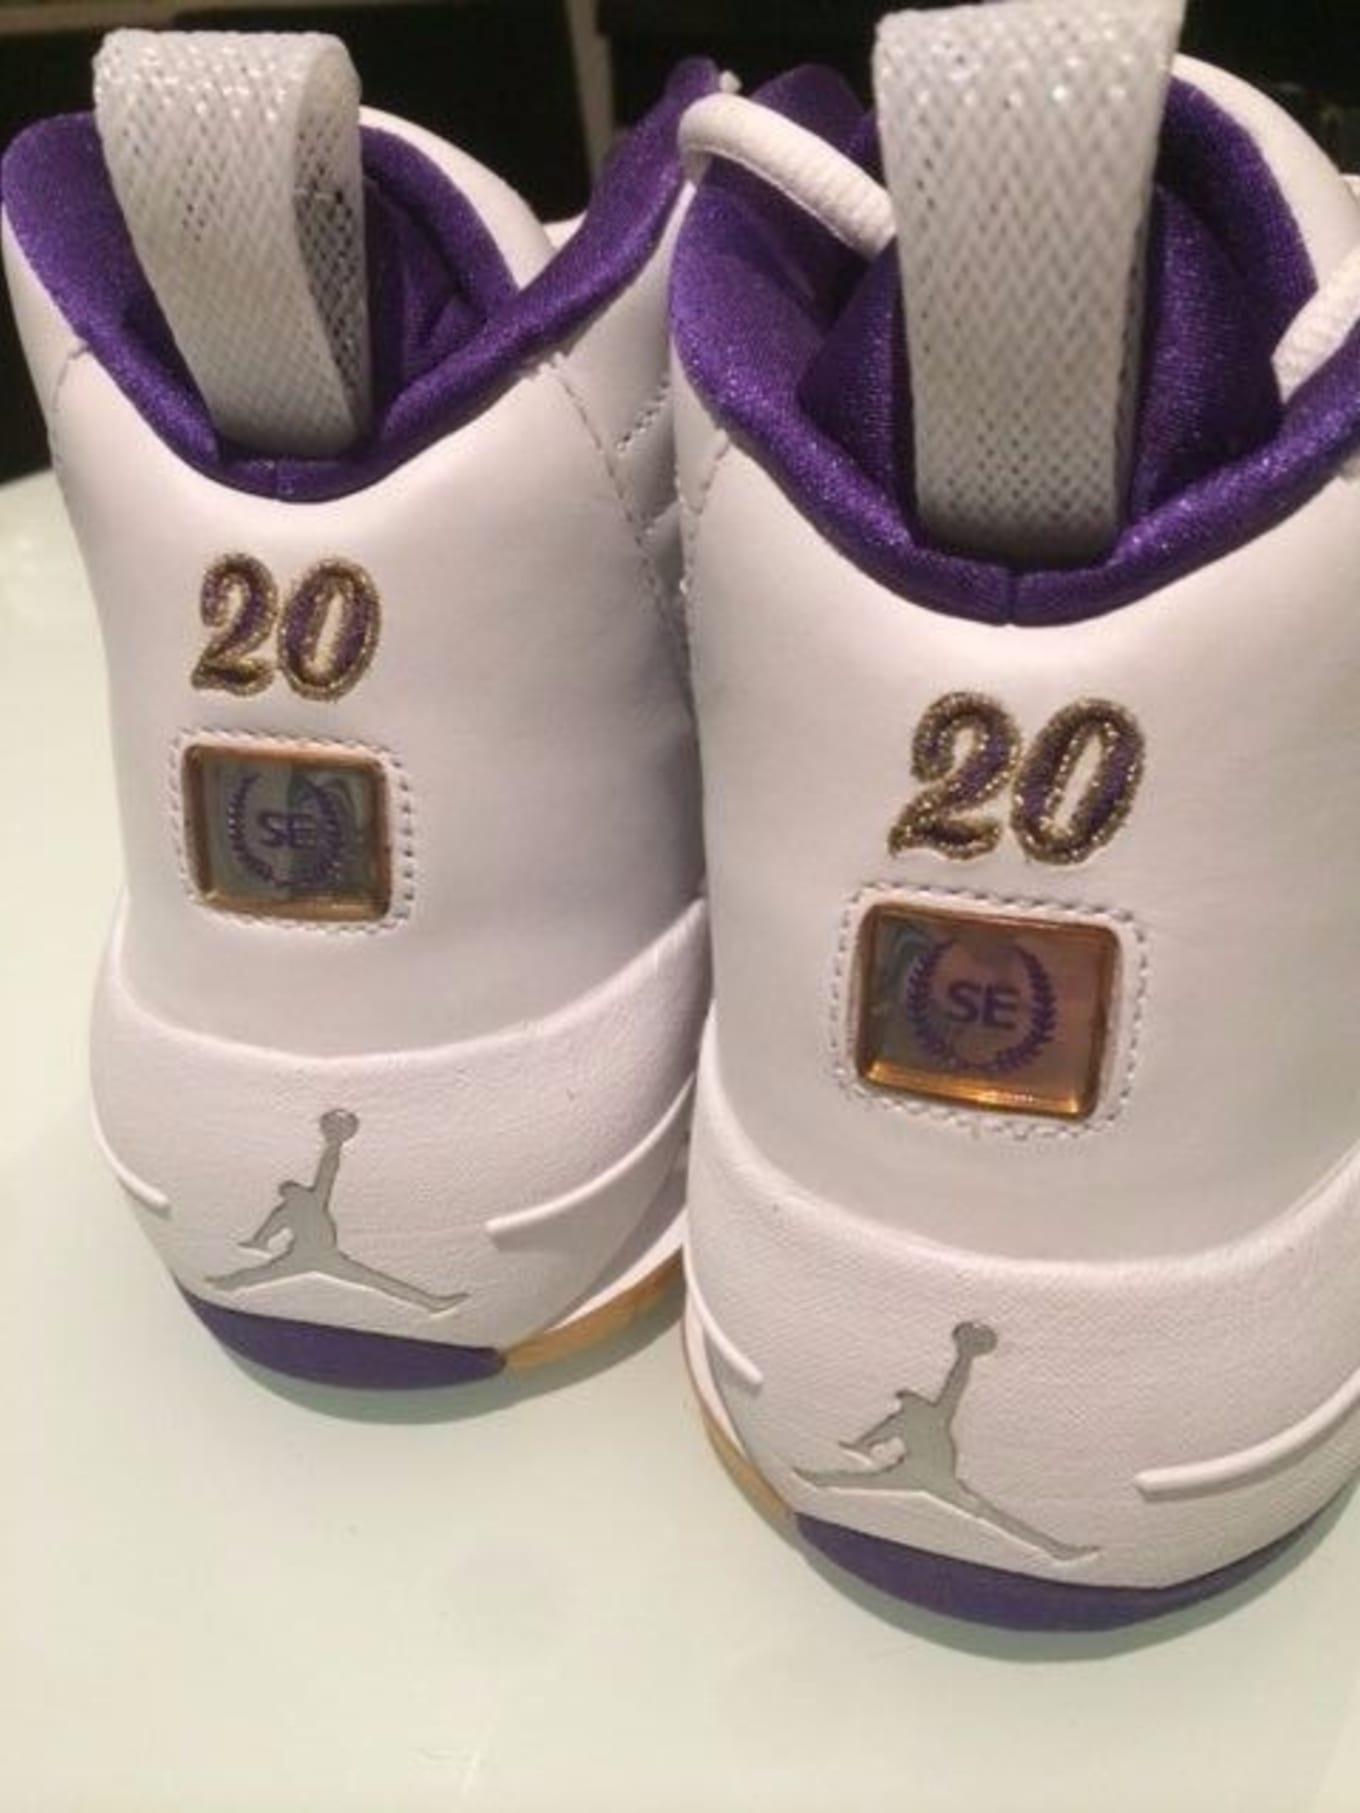 e0f3dfeb30ba Air Jordan Player Exclusive Ebay